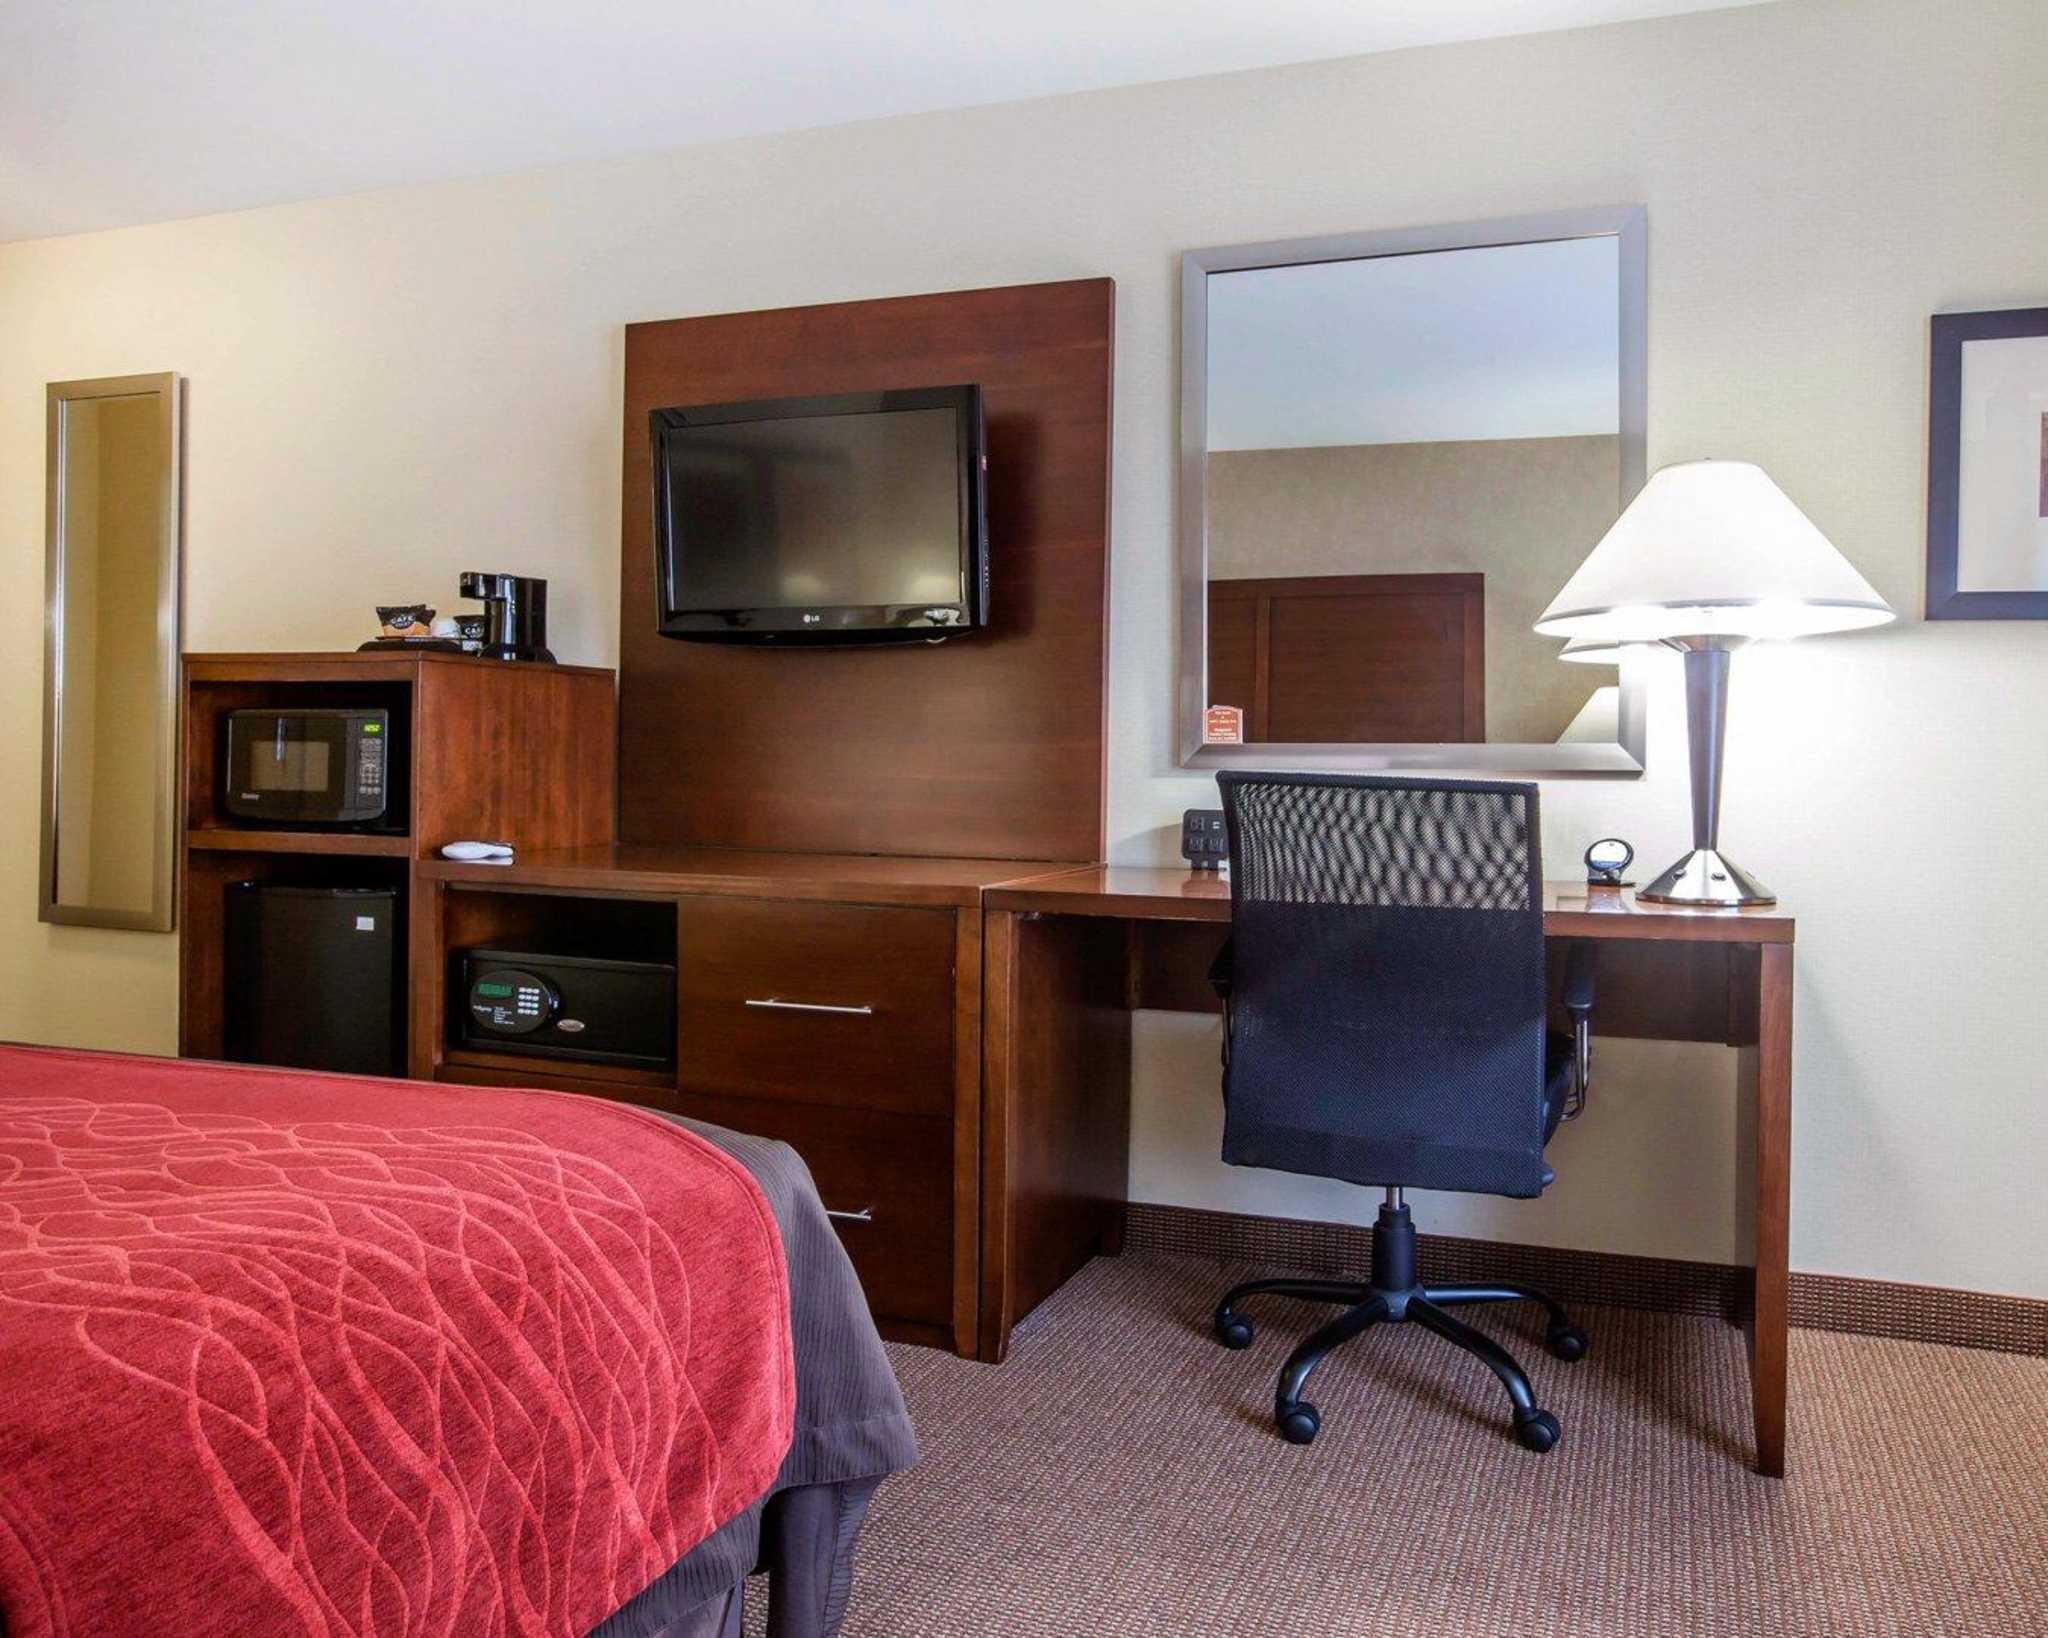 Comfort Inn & Suites adj to Akwesasne Mohawk Casino image 12